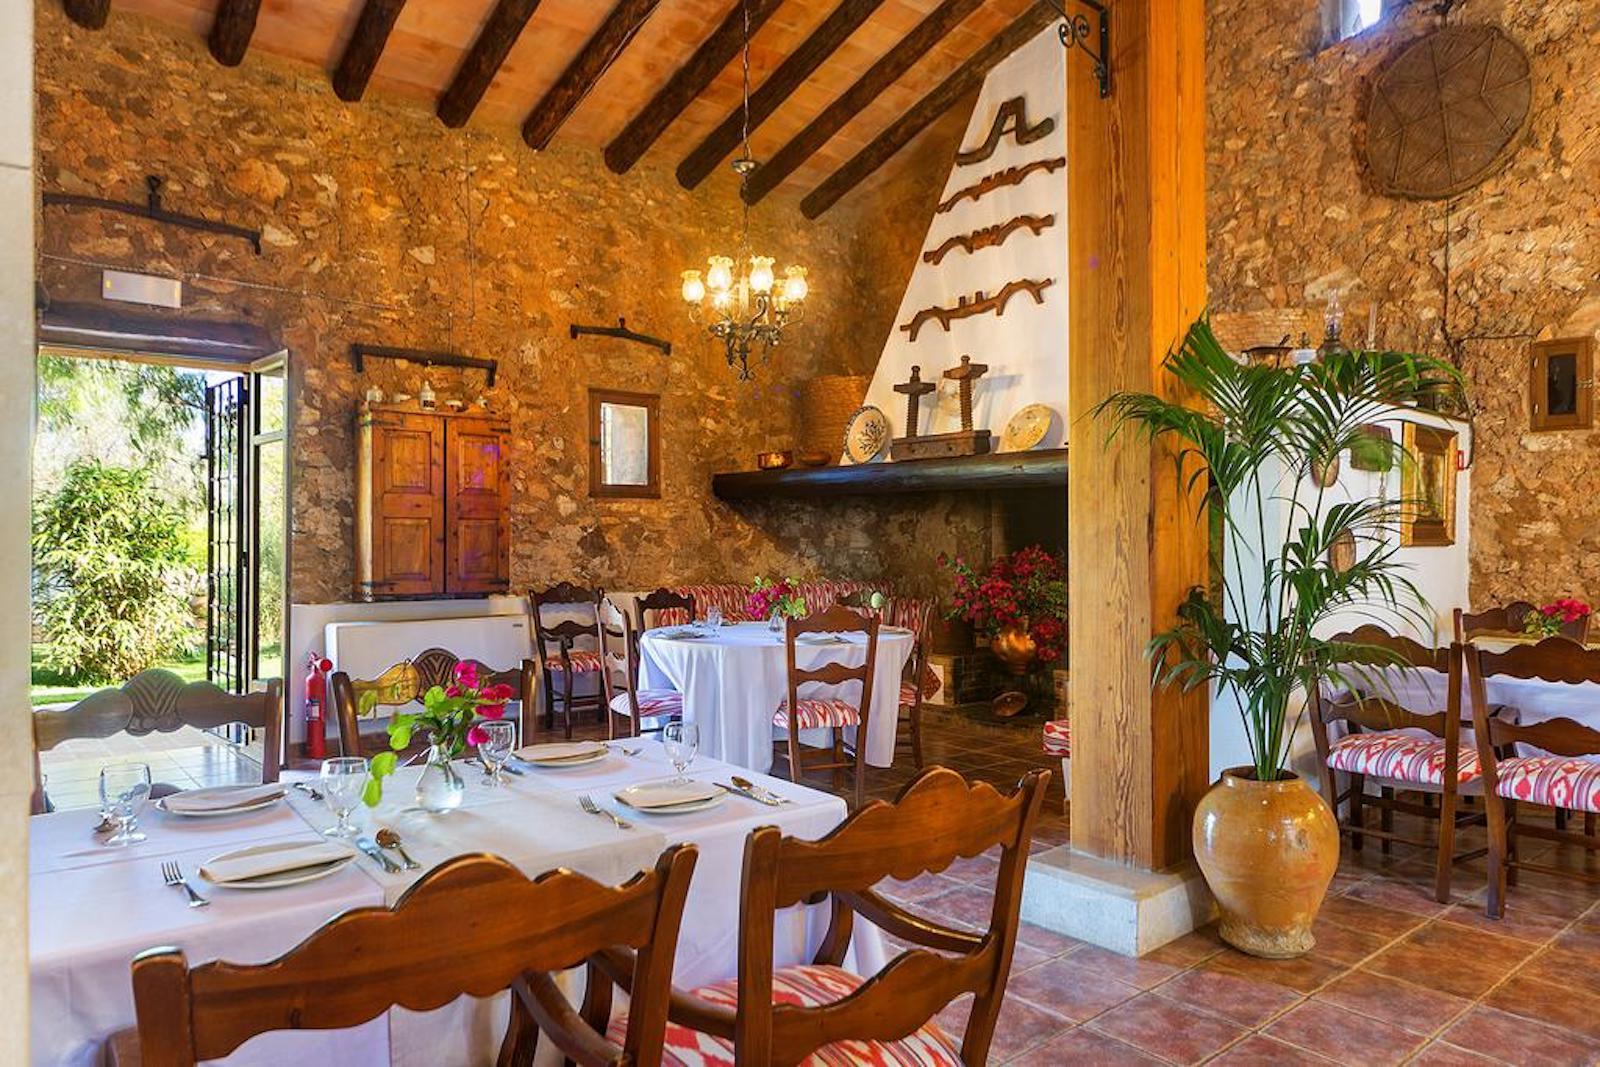 ISLA-Travel-Finca-Hotel-Mallorca-Essbereich